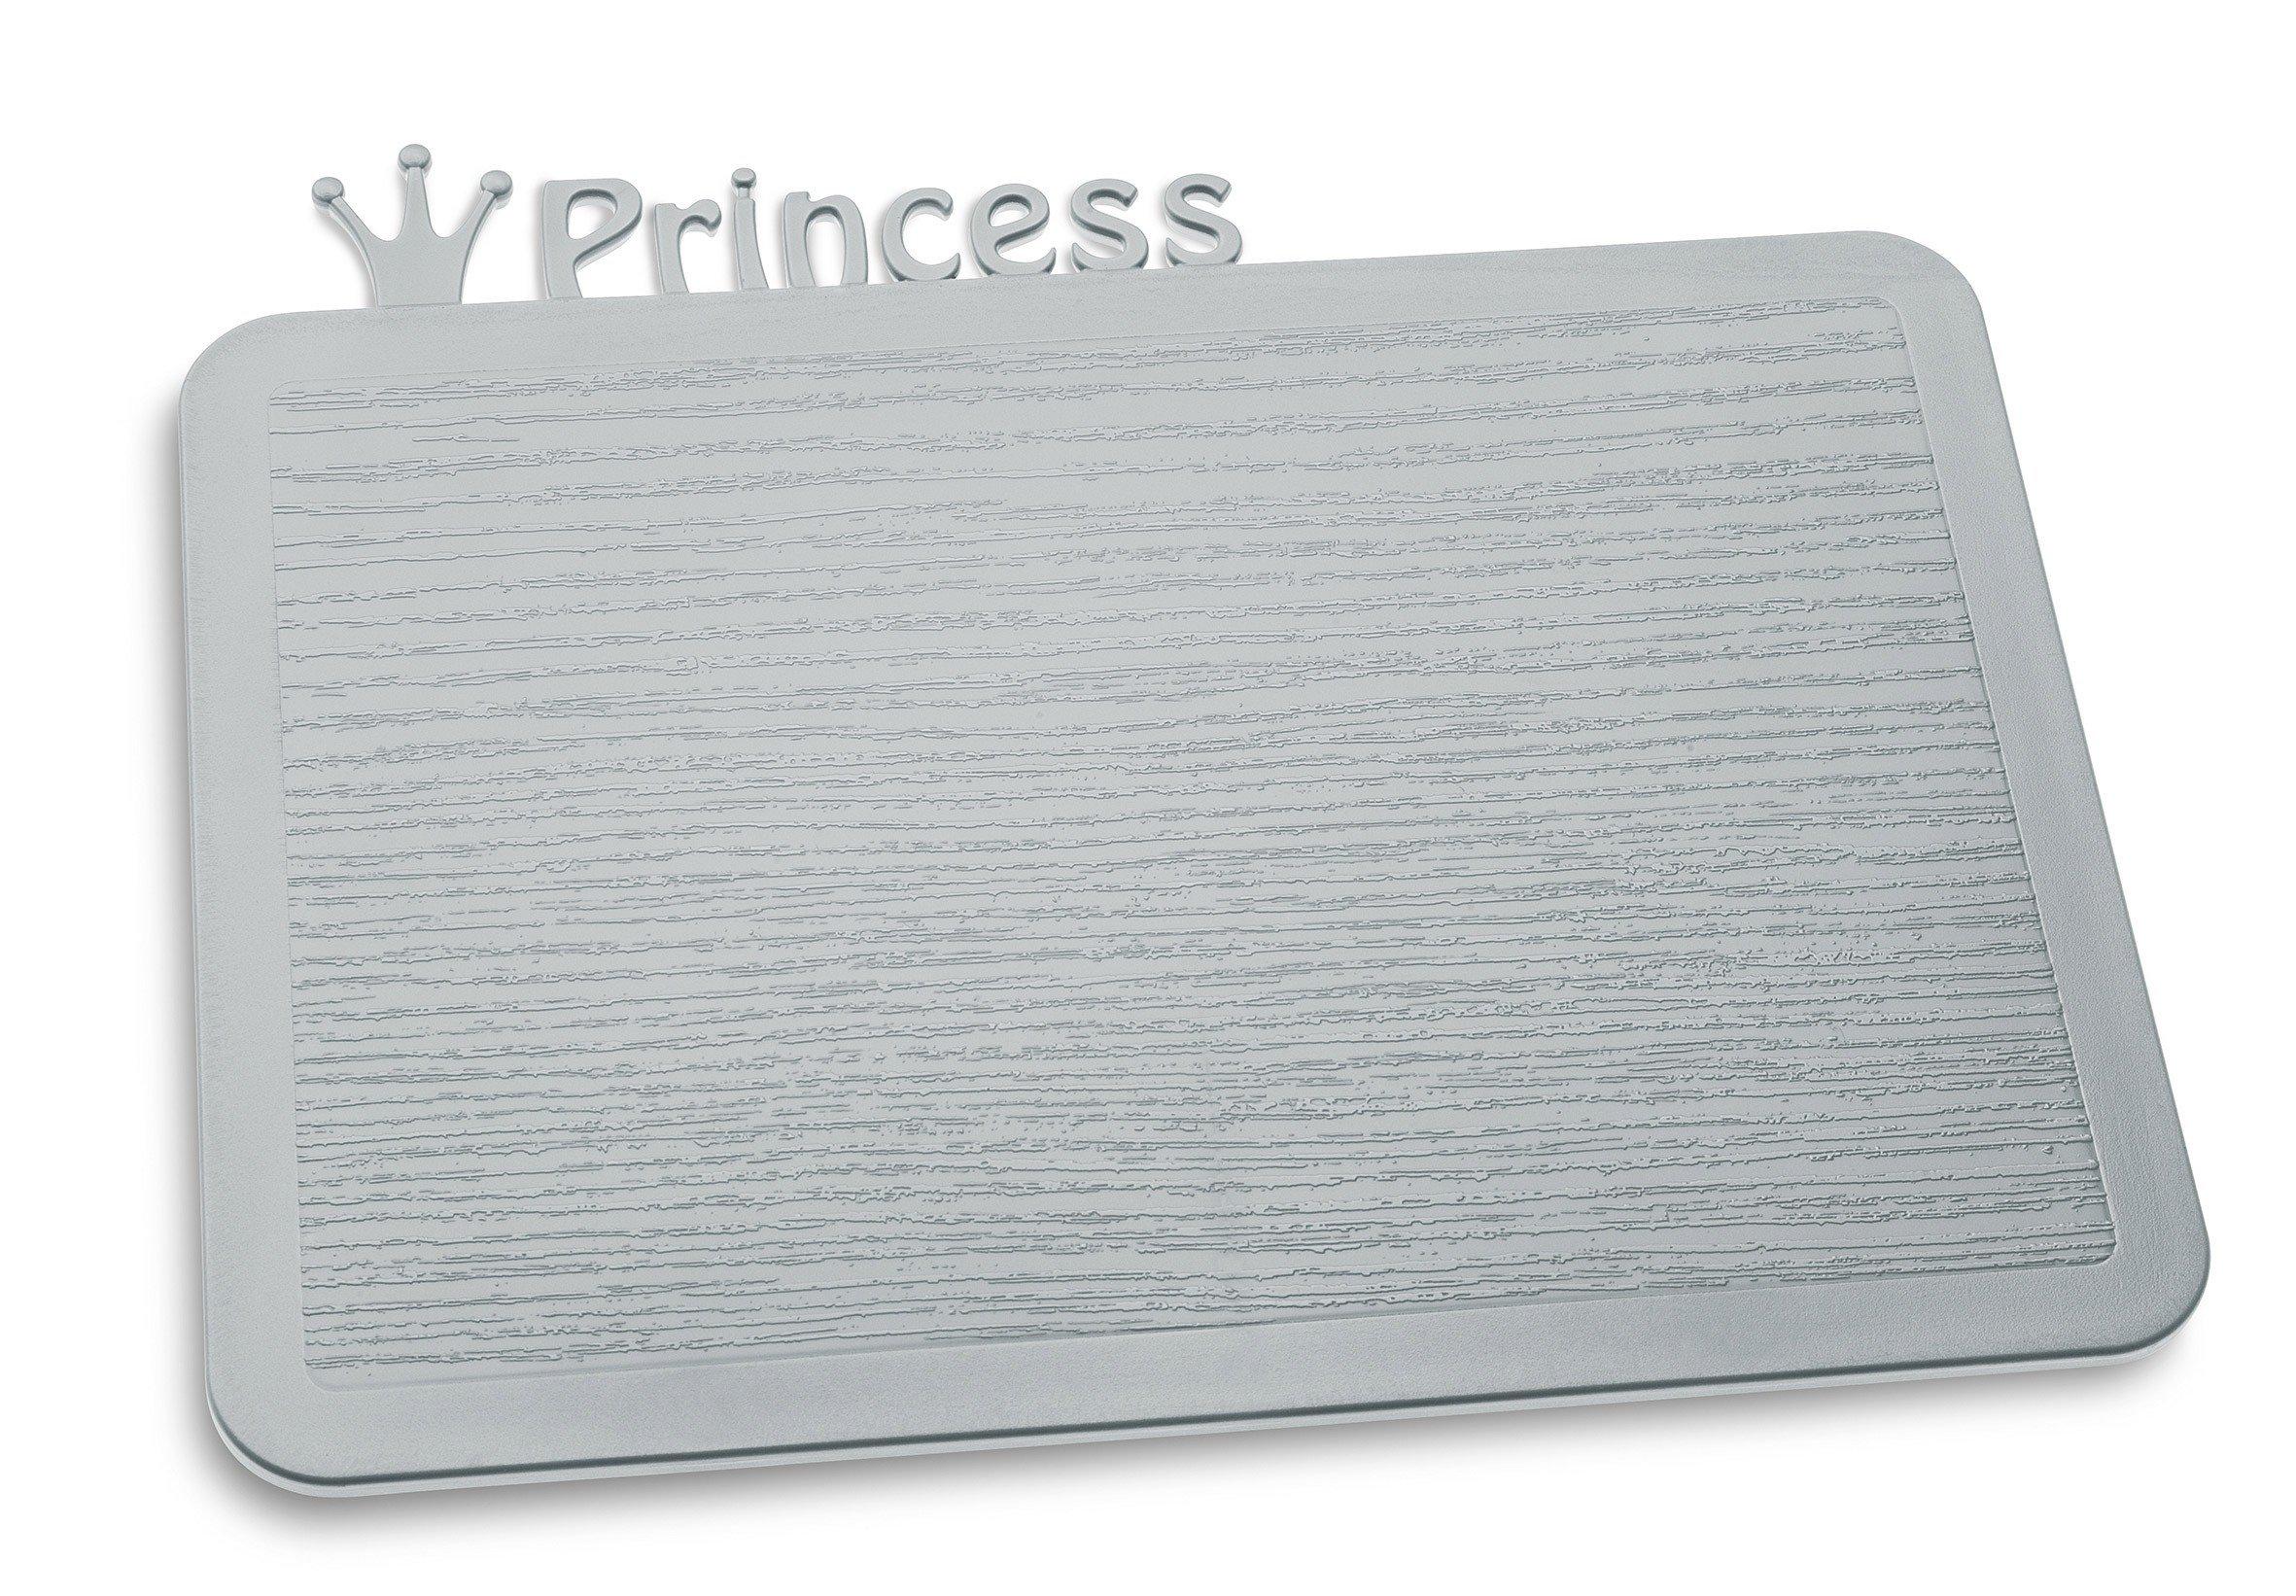 Deska śniadaniowa Happy Boards Princess szara